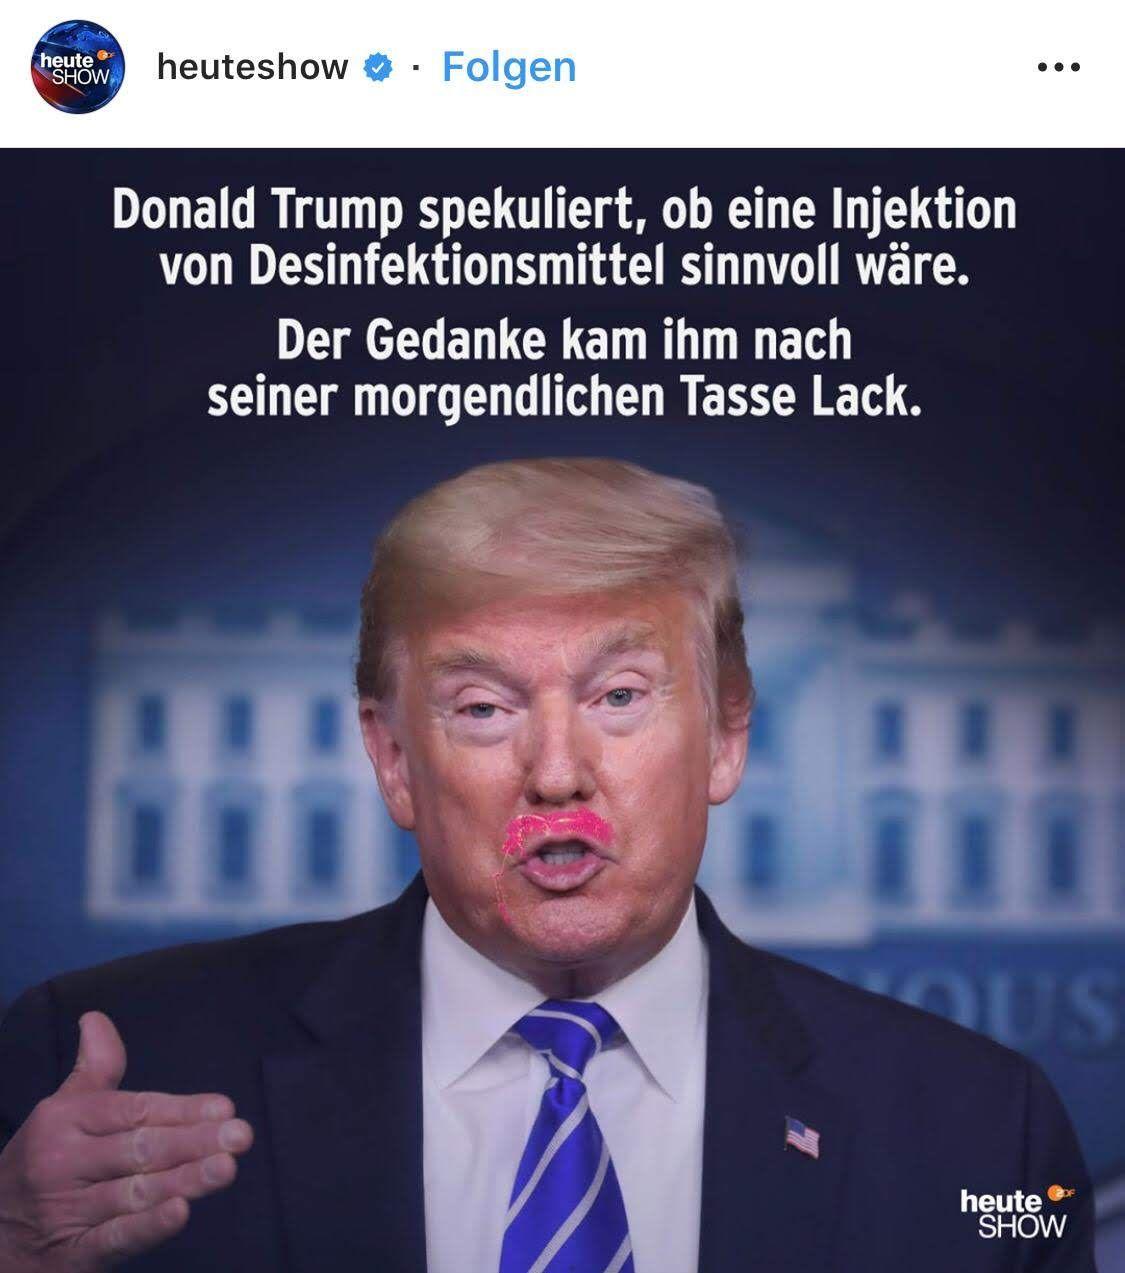 Donald Trump Desinfektion